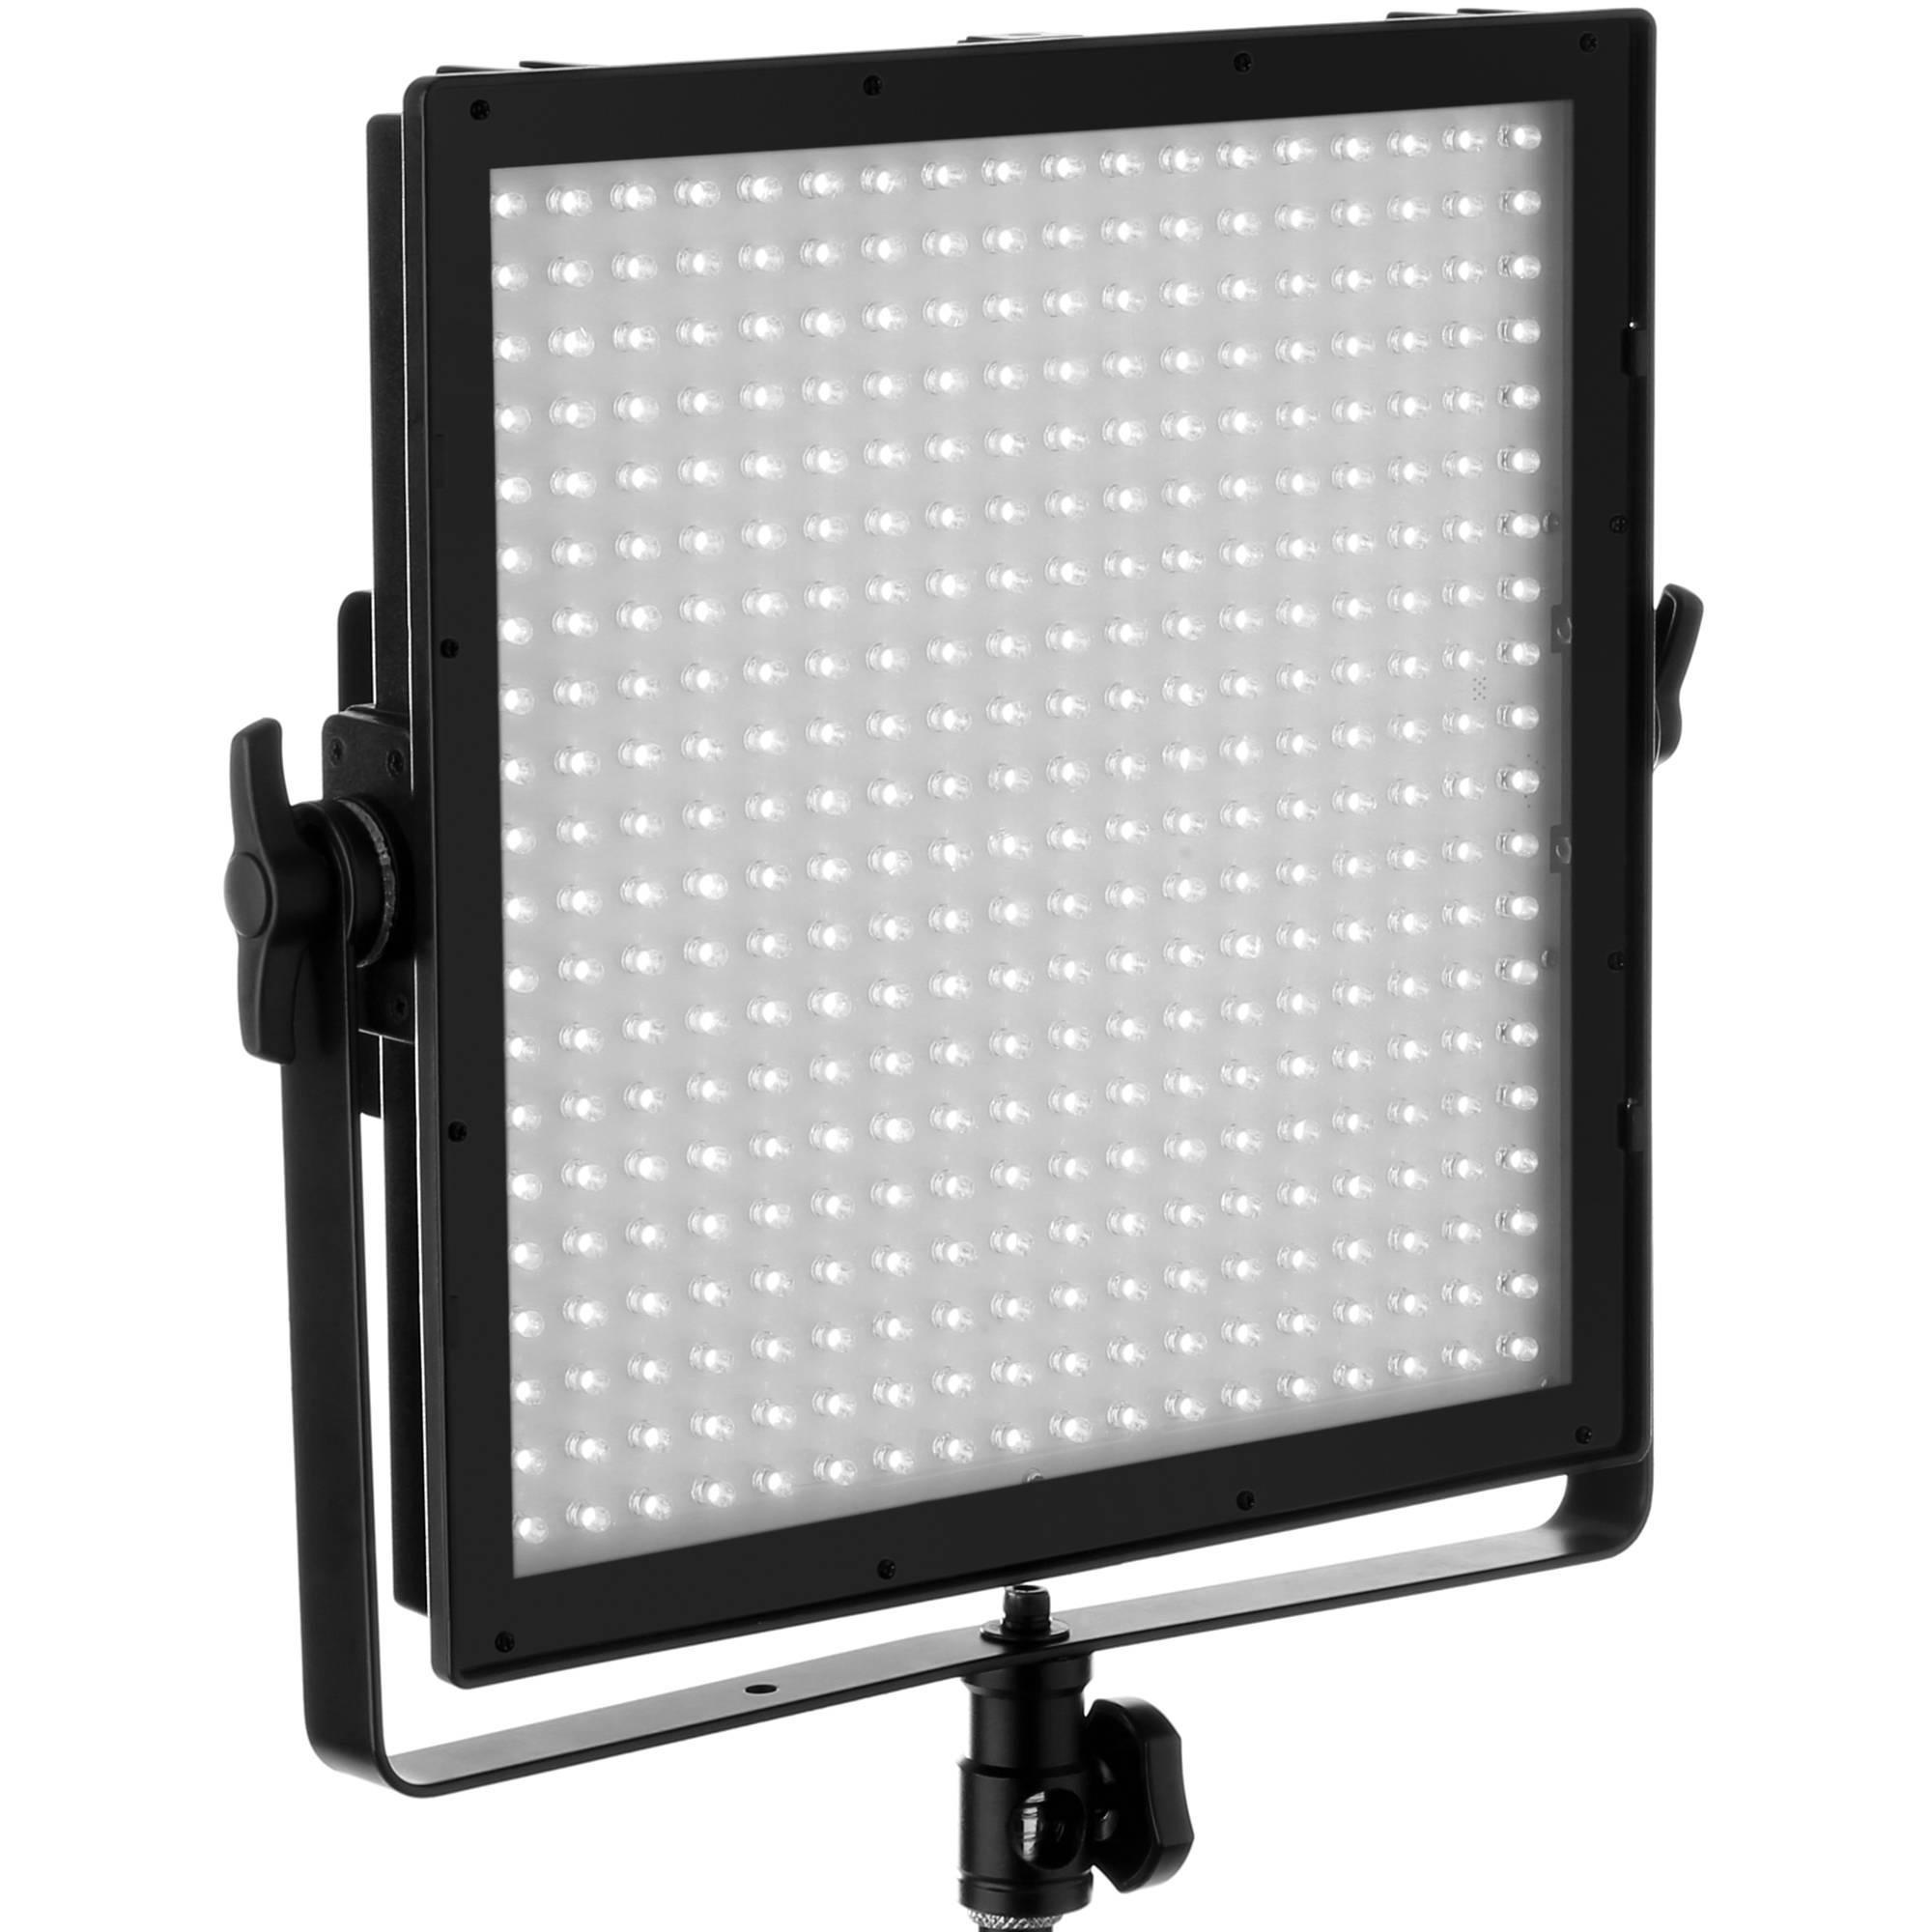 Daylight Balanced Led Studio Light: Genaray SpectroLED Essential 360 Daylight LED Light SP-E-360D